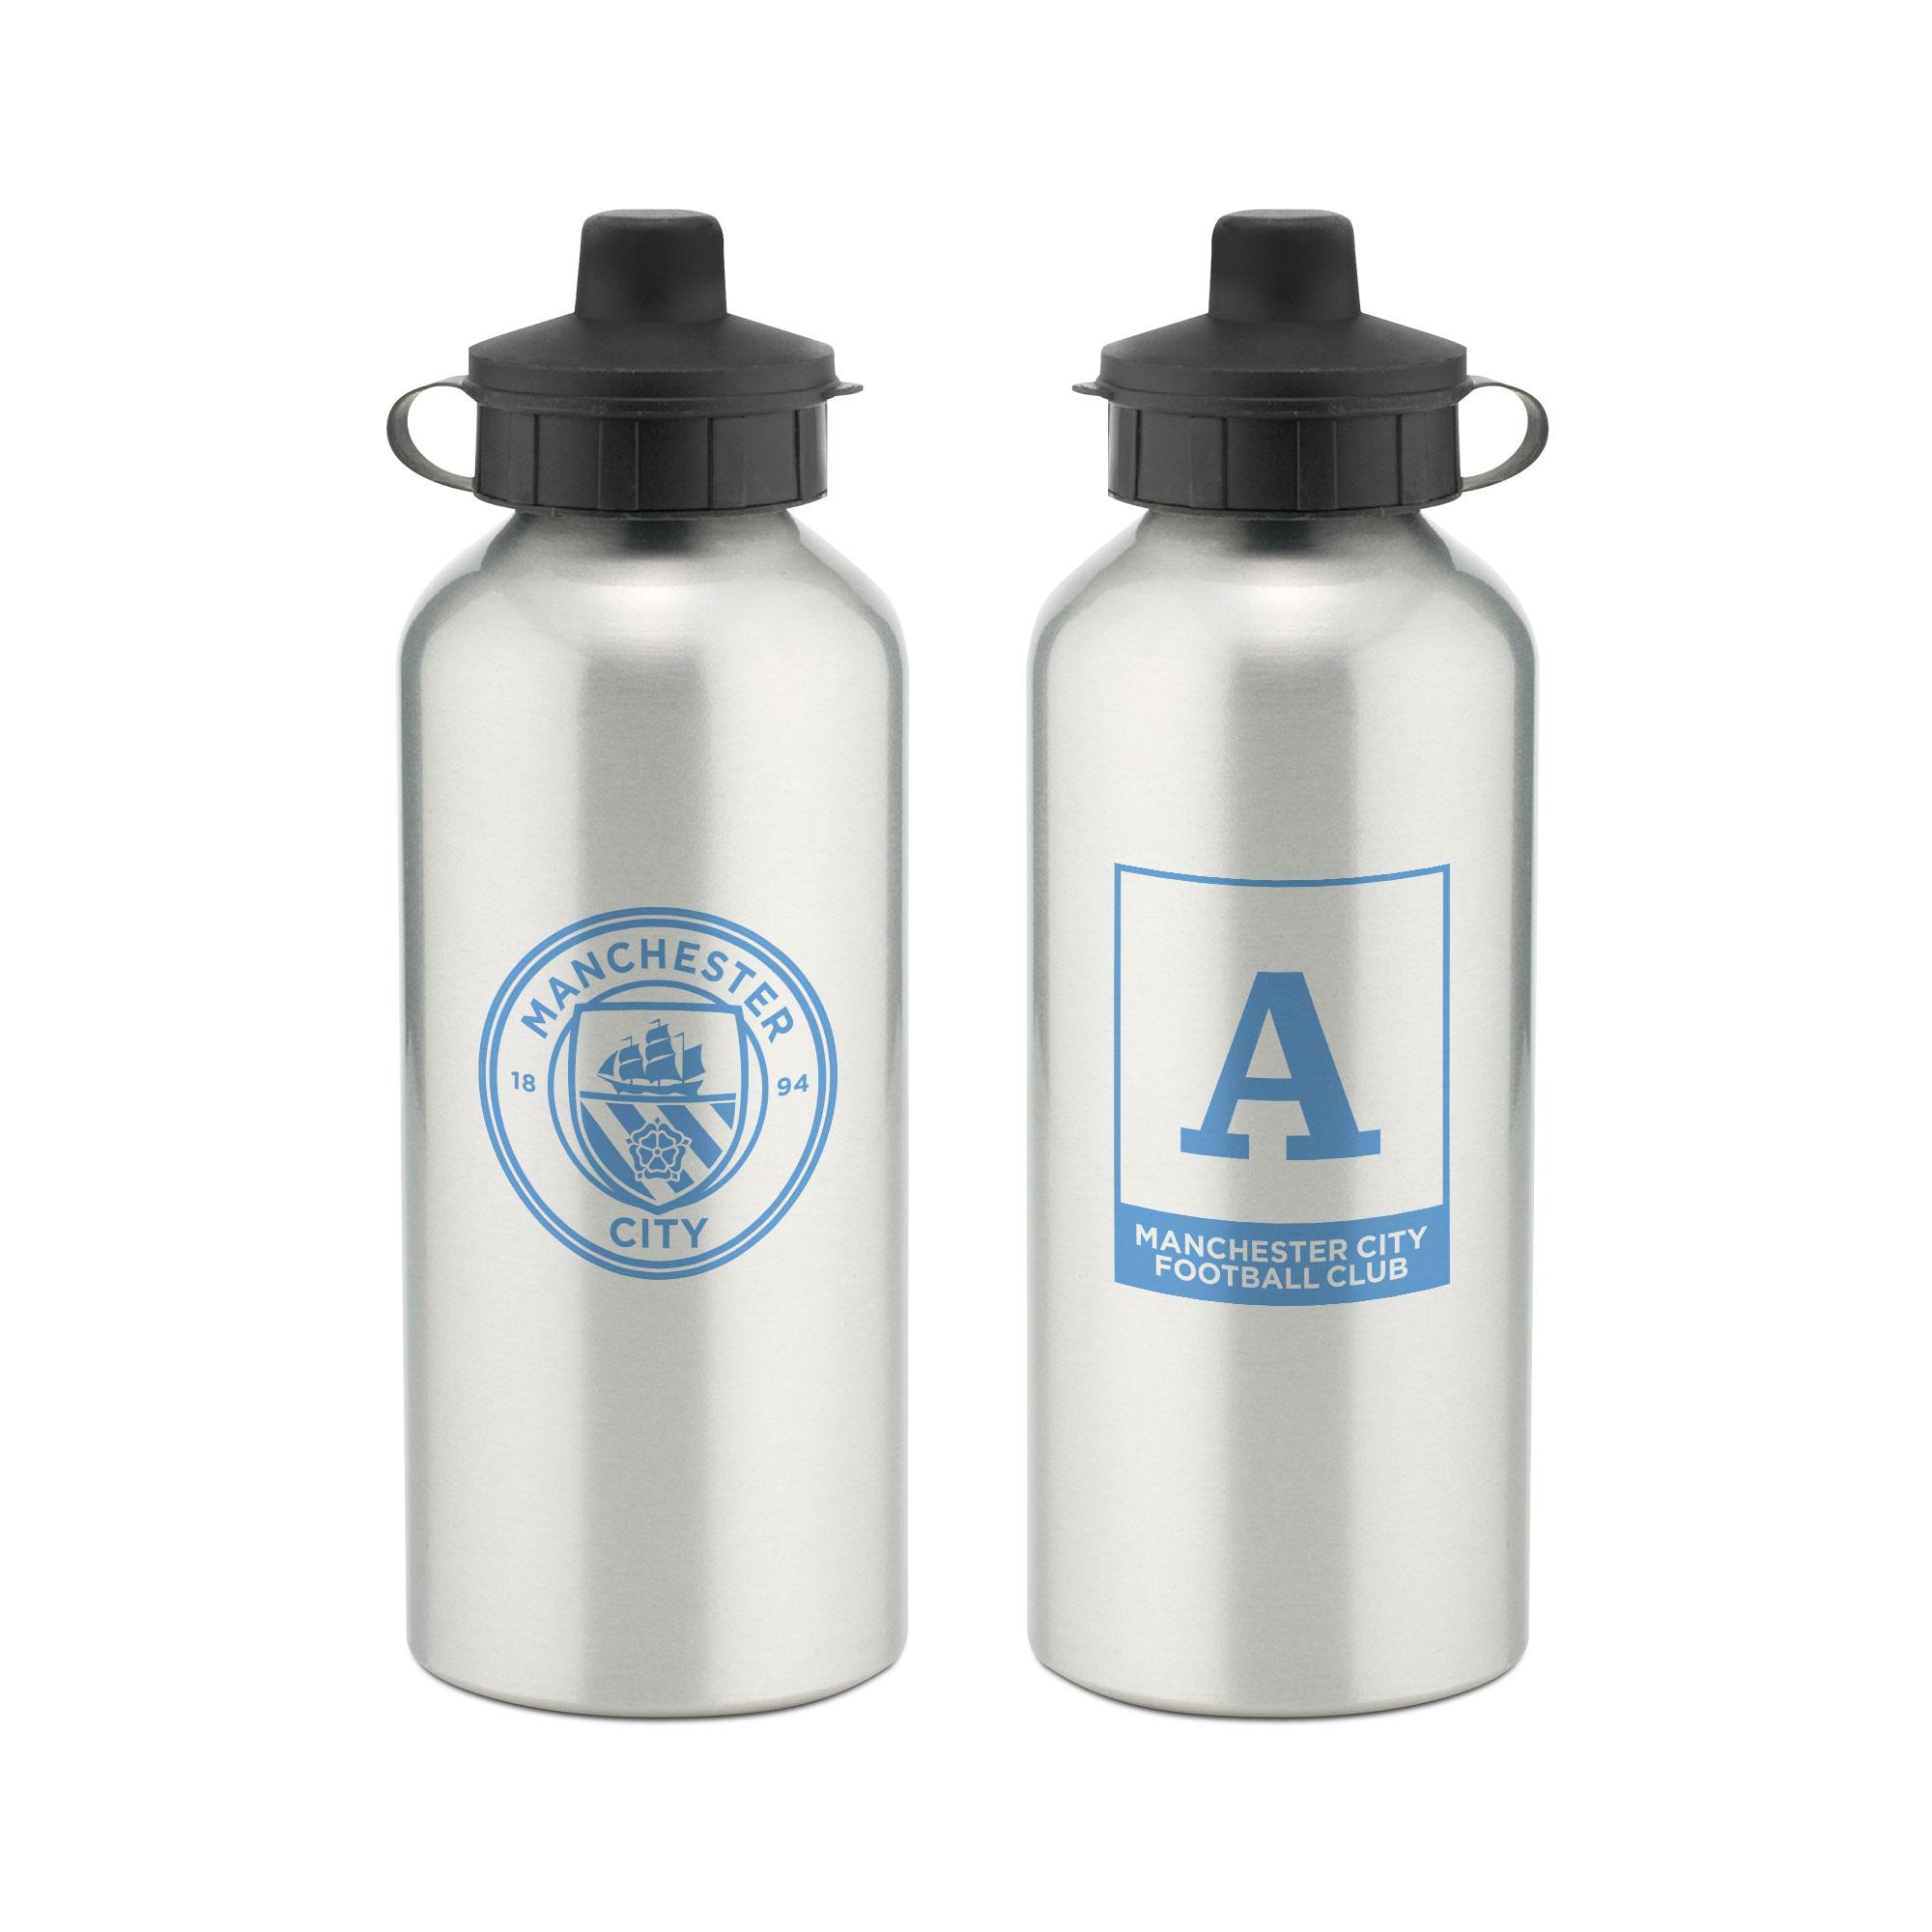 Manchester City FC Monogram Aluminium Water Bottle